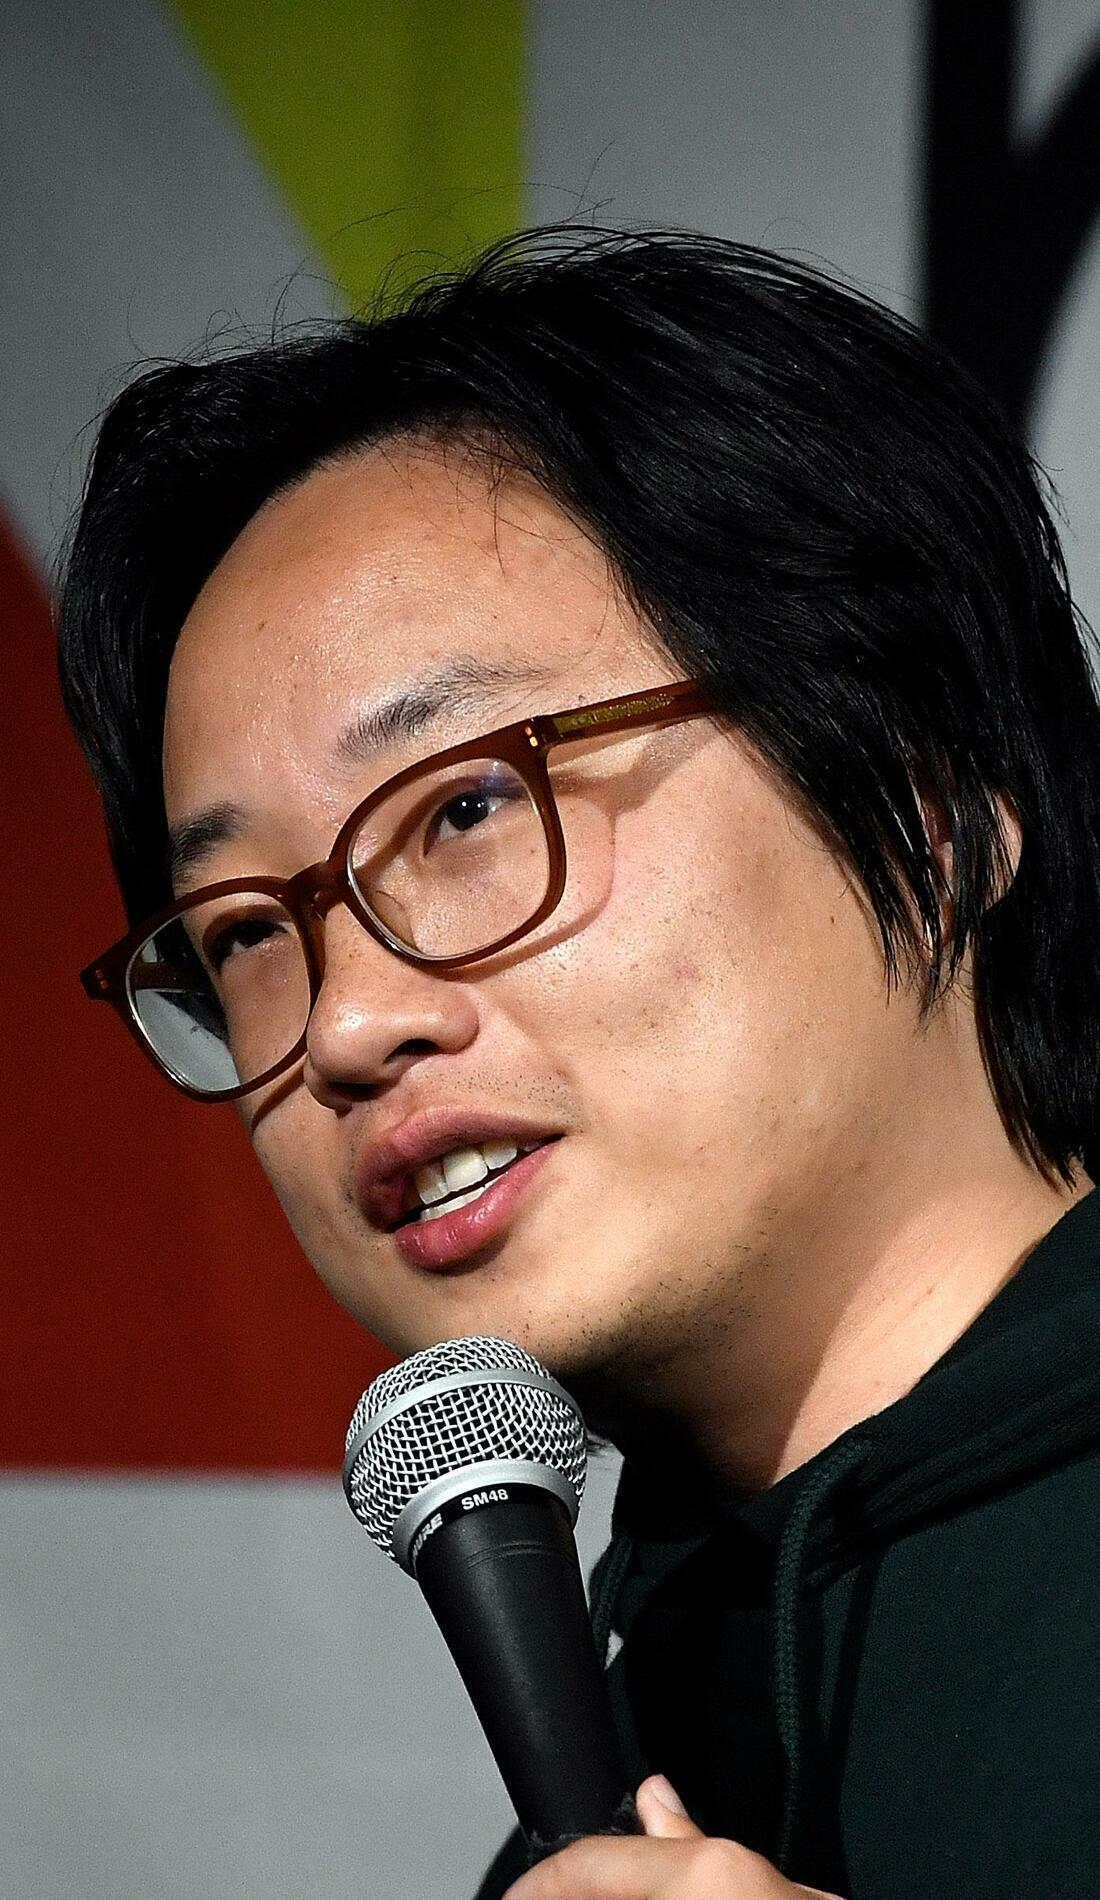 A Jimmy O. Yang live event